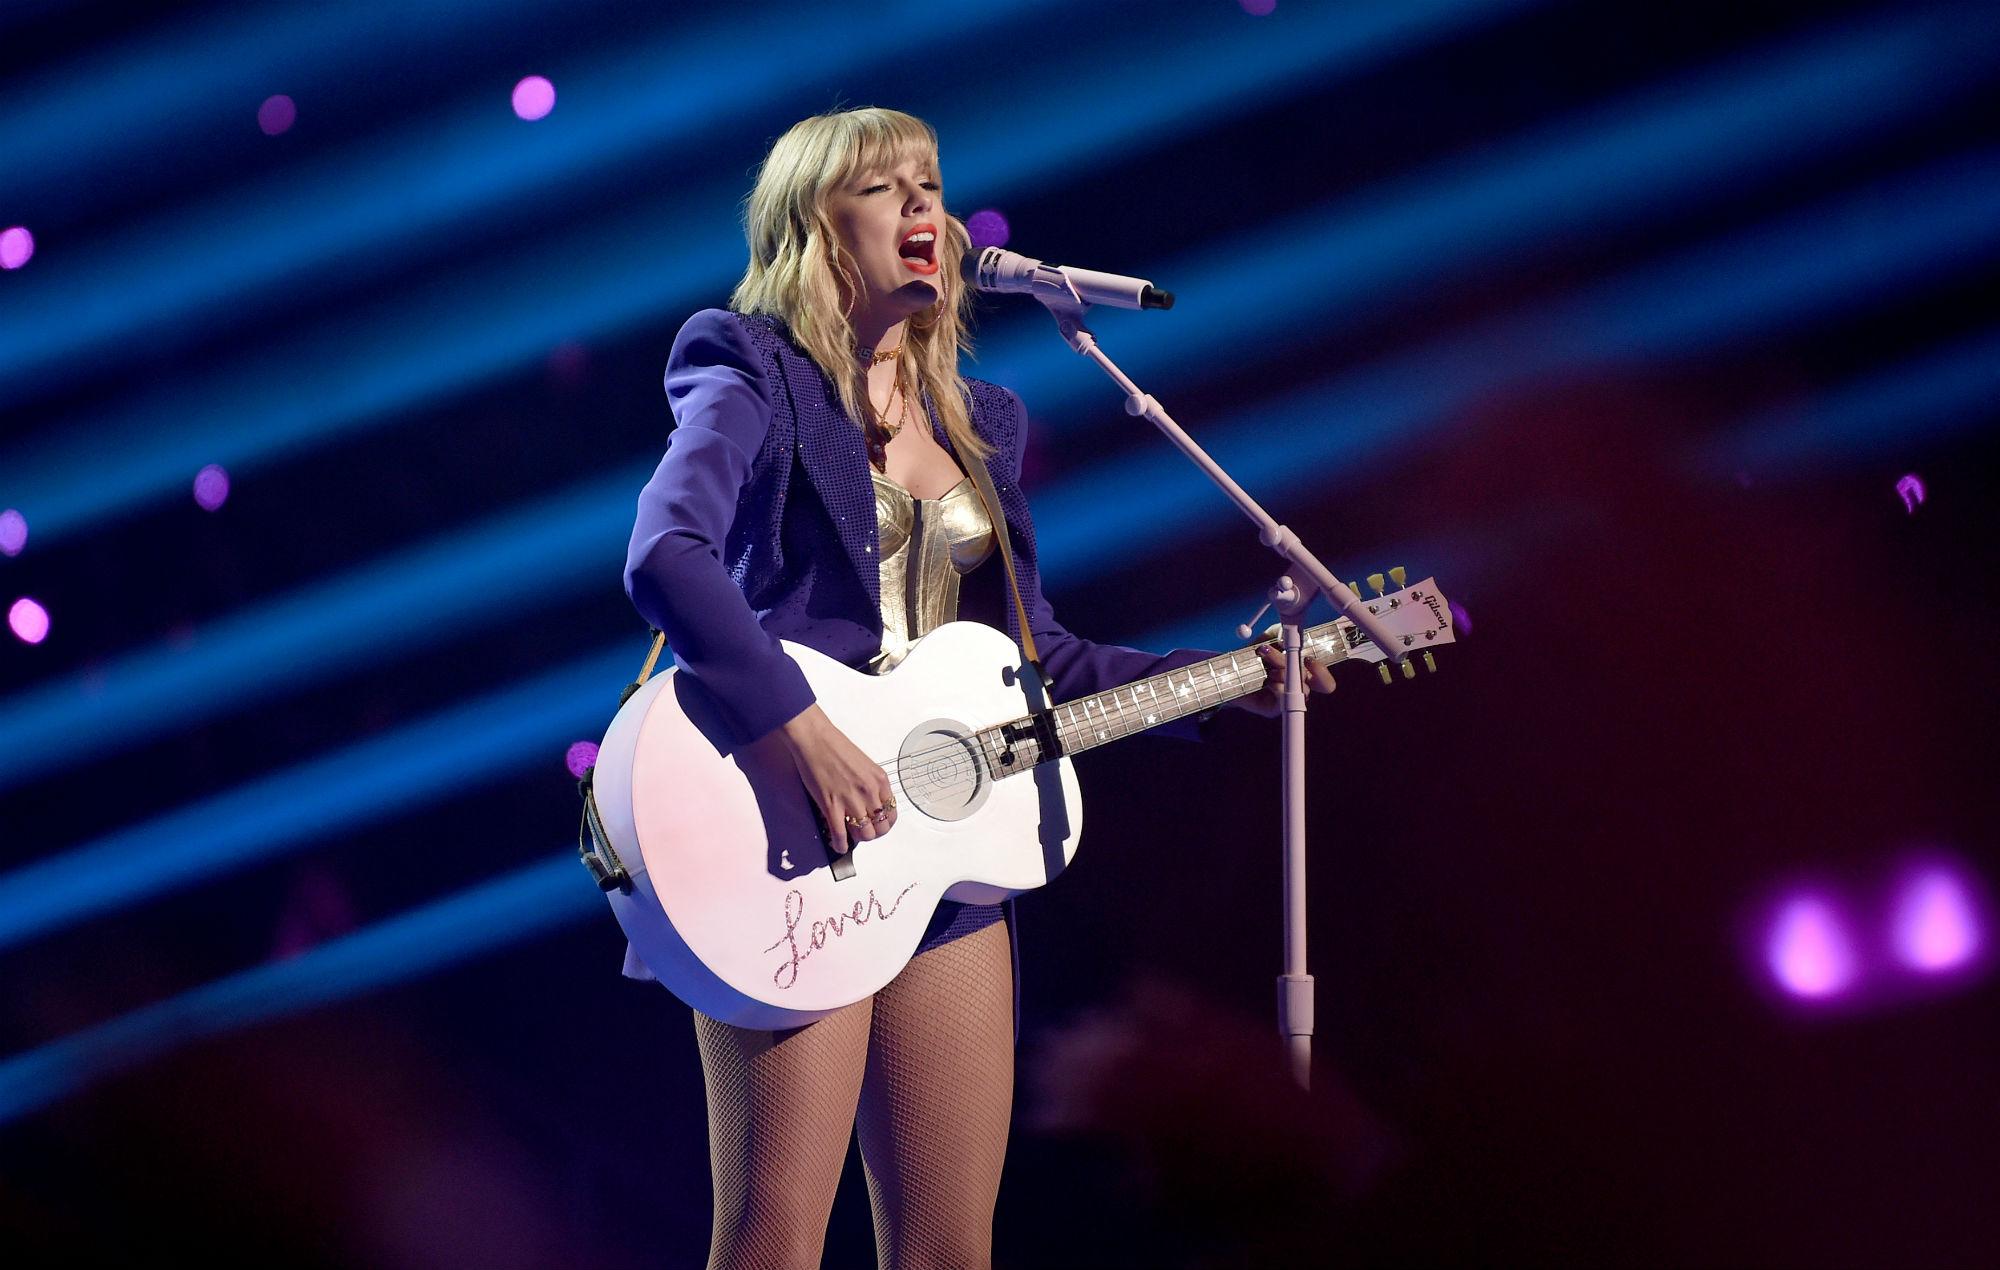 Taylor Swifts team responds to Big Machines denial